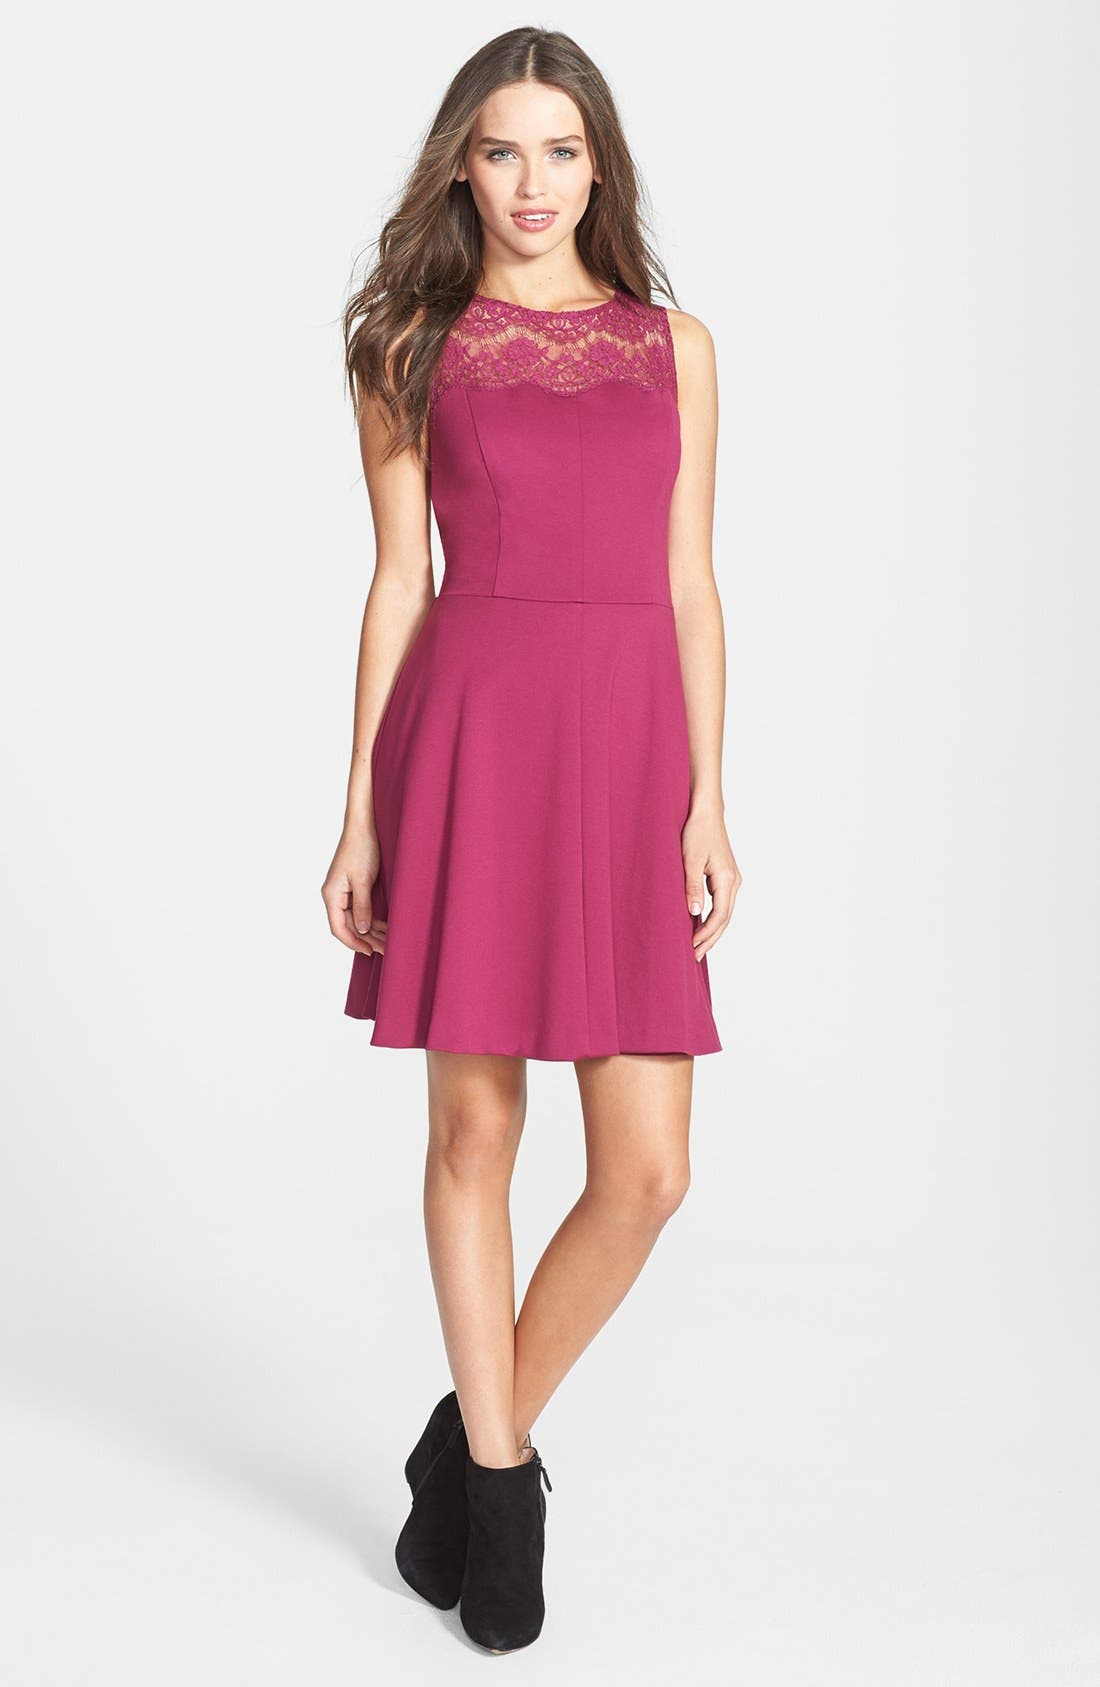 Alternate Image 1 Selected - Jessica Simpson Lace Yoke Ponte Fit & Flare Dress